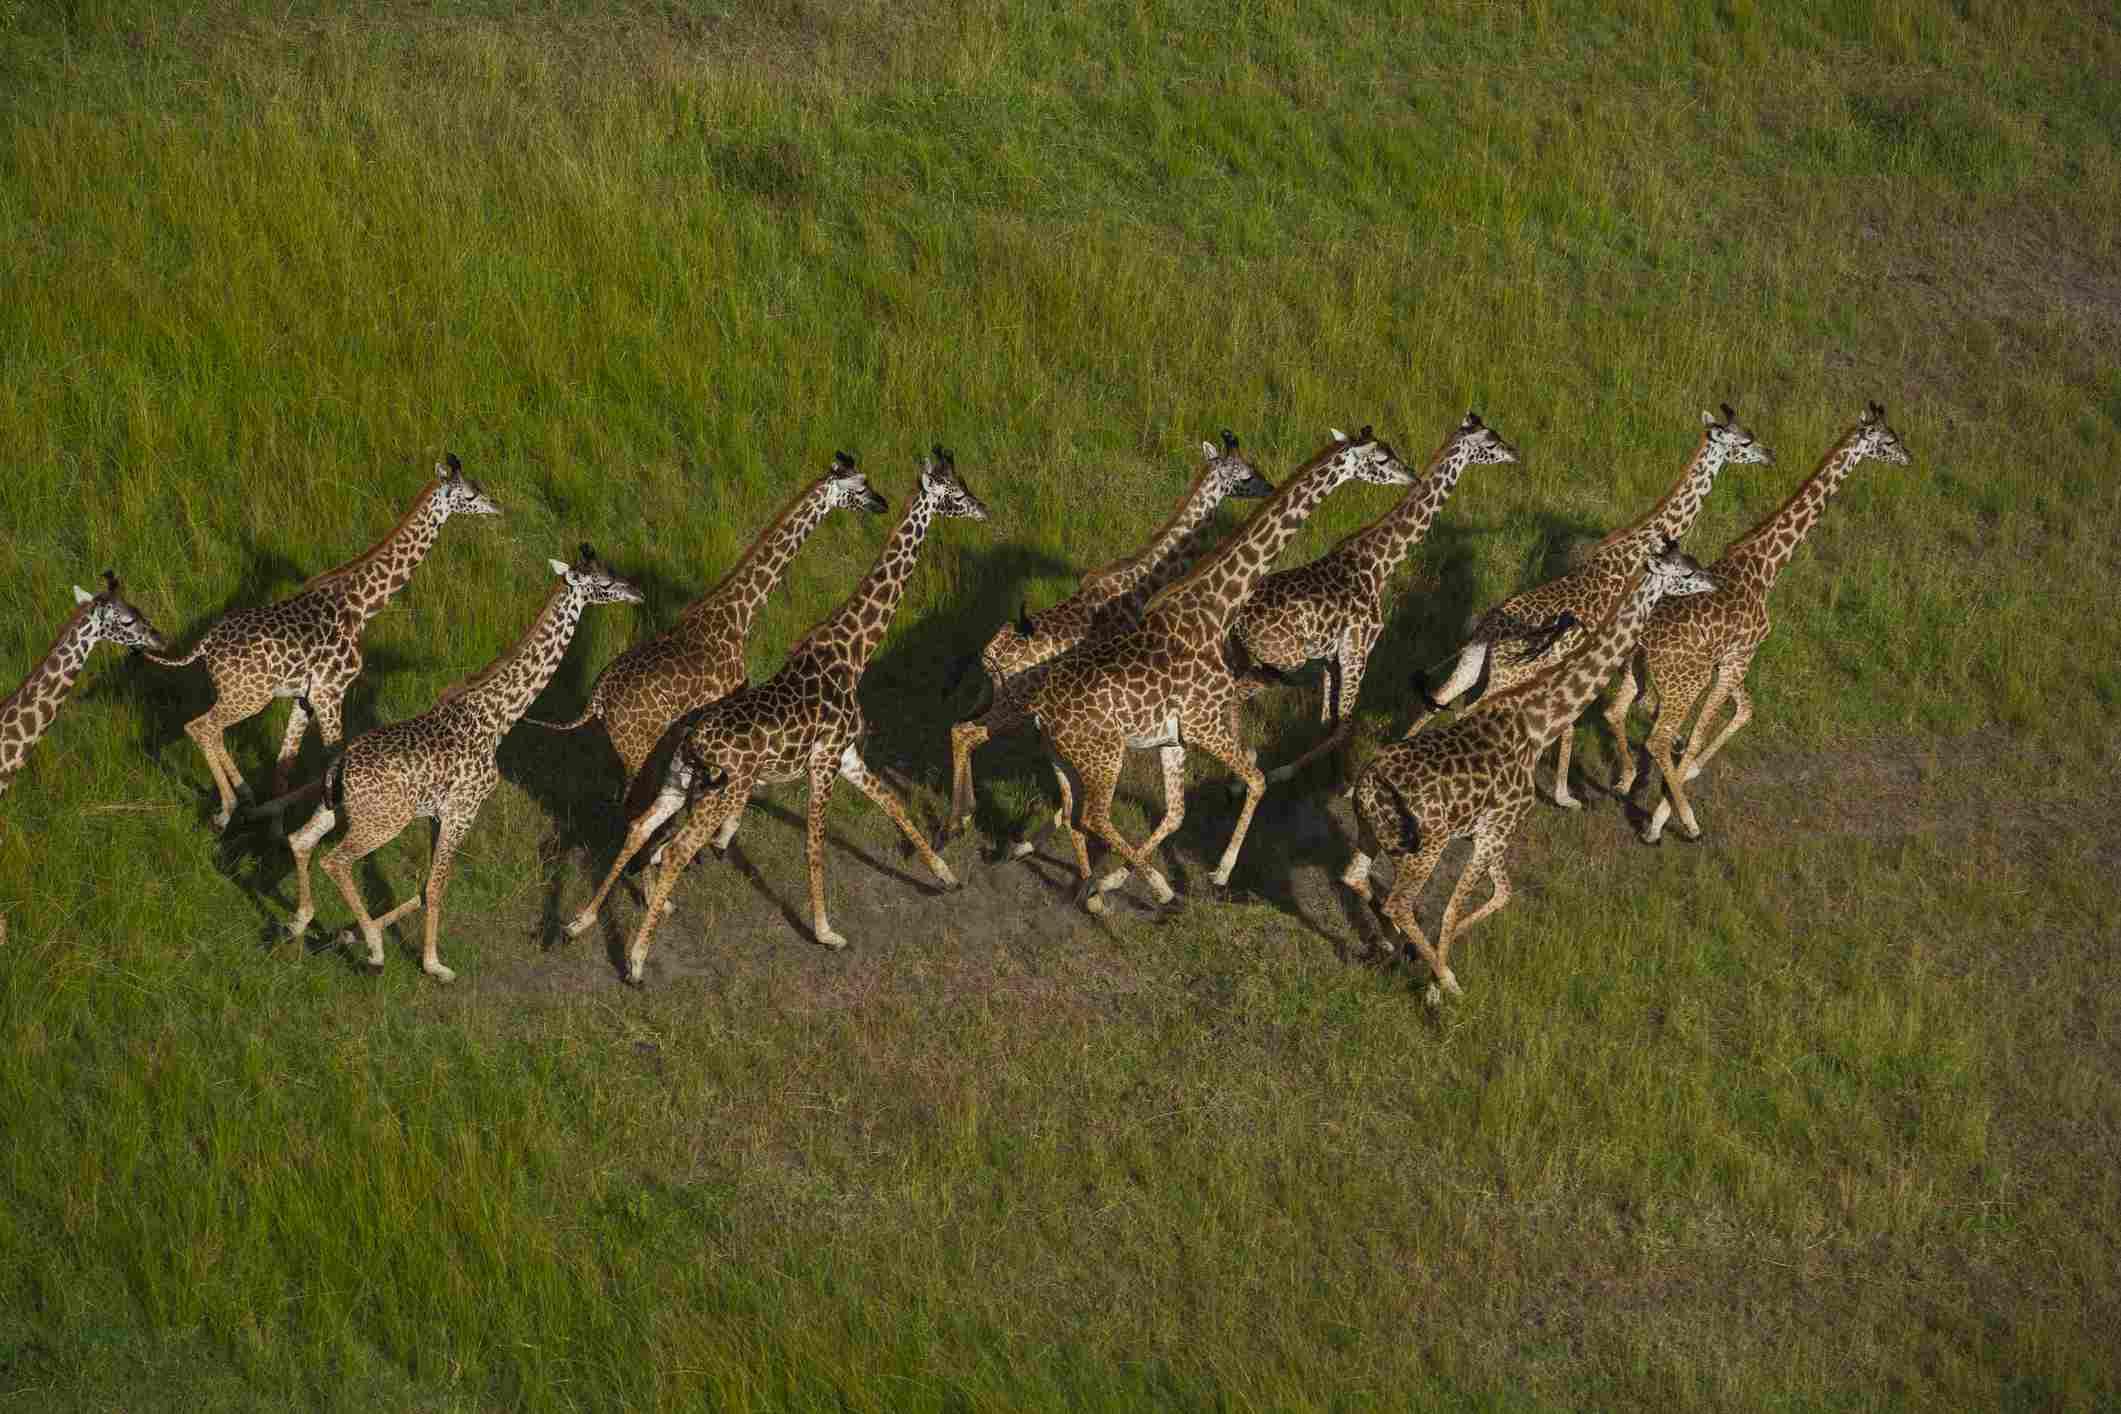 Giraffes, Masai Mara National Reserve, Kenya (1°15' S, 35°15' E).